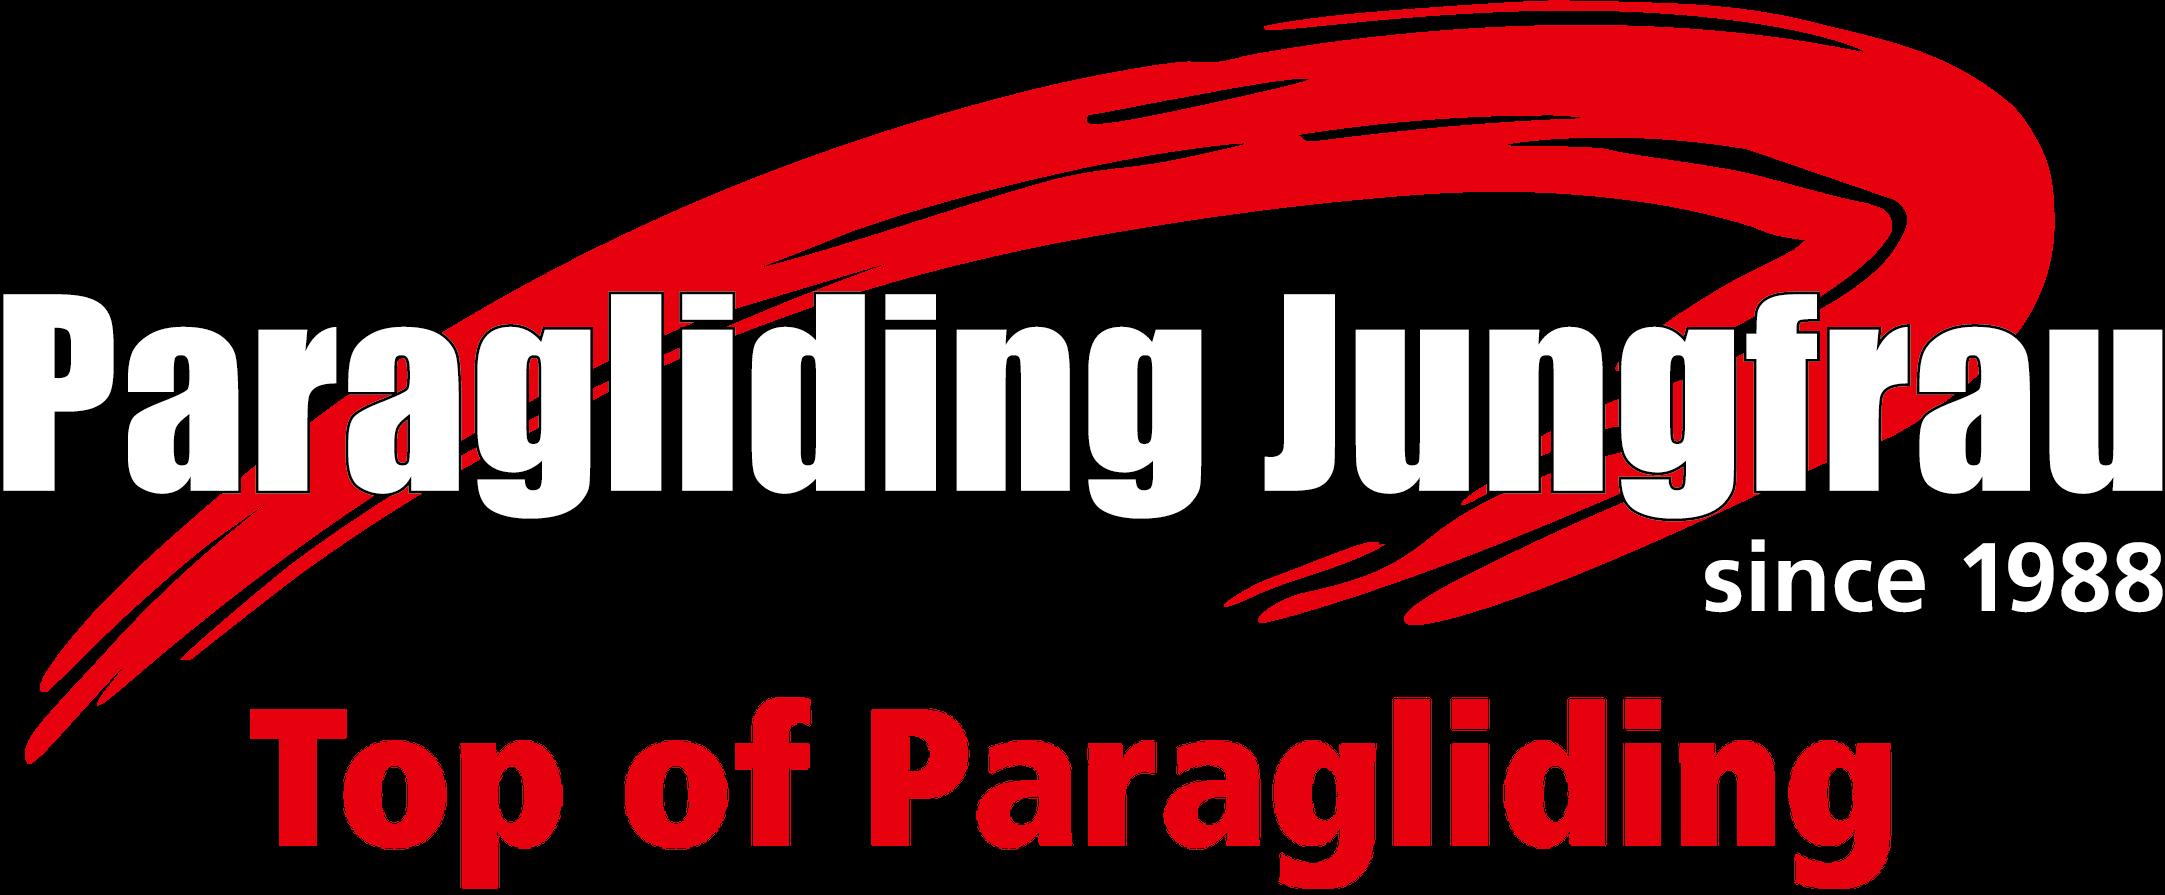 Paragliding Jungfrau